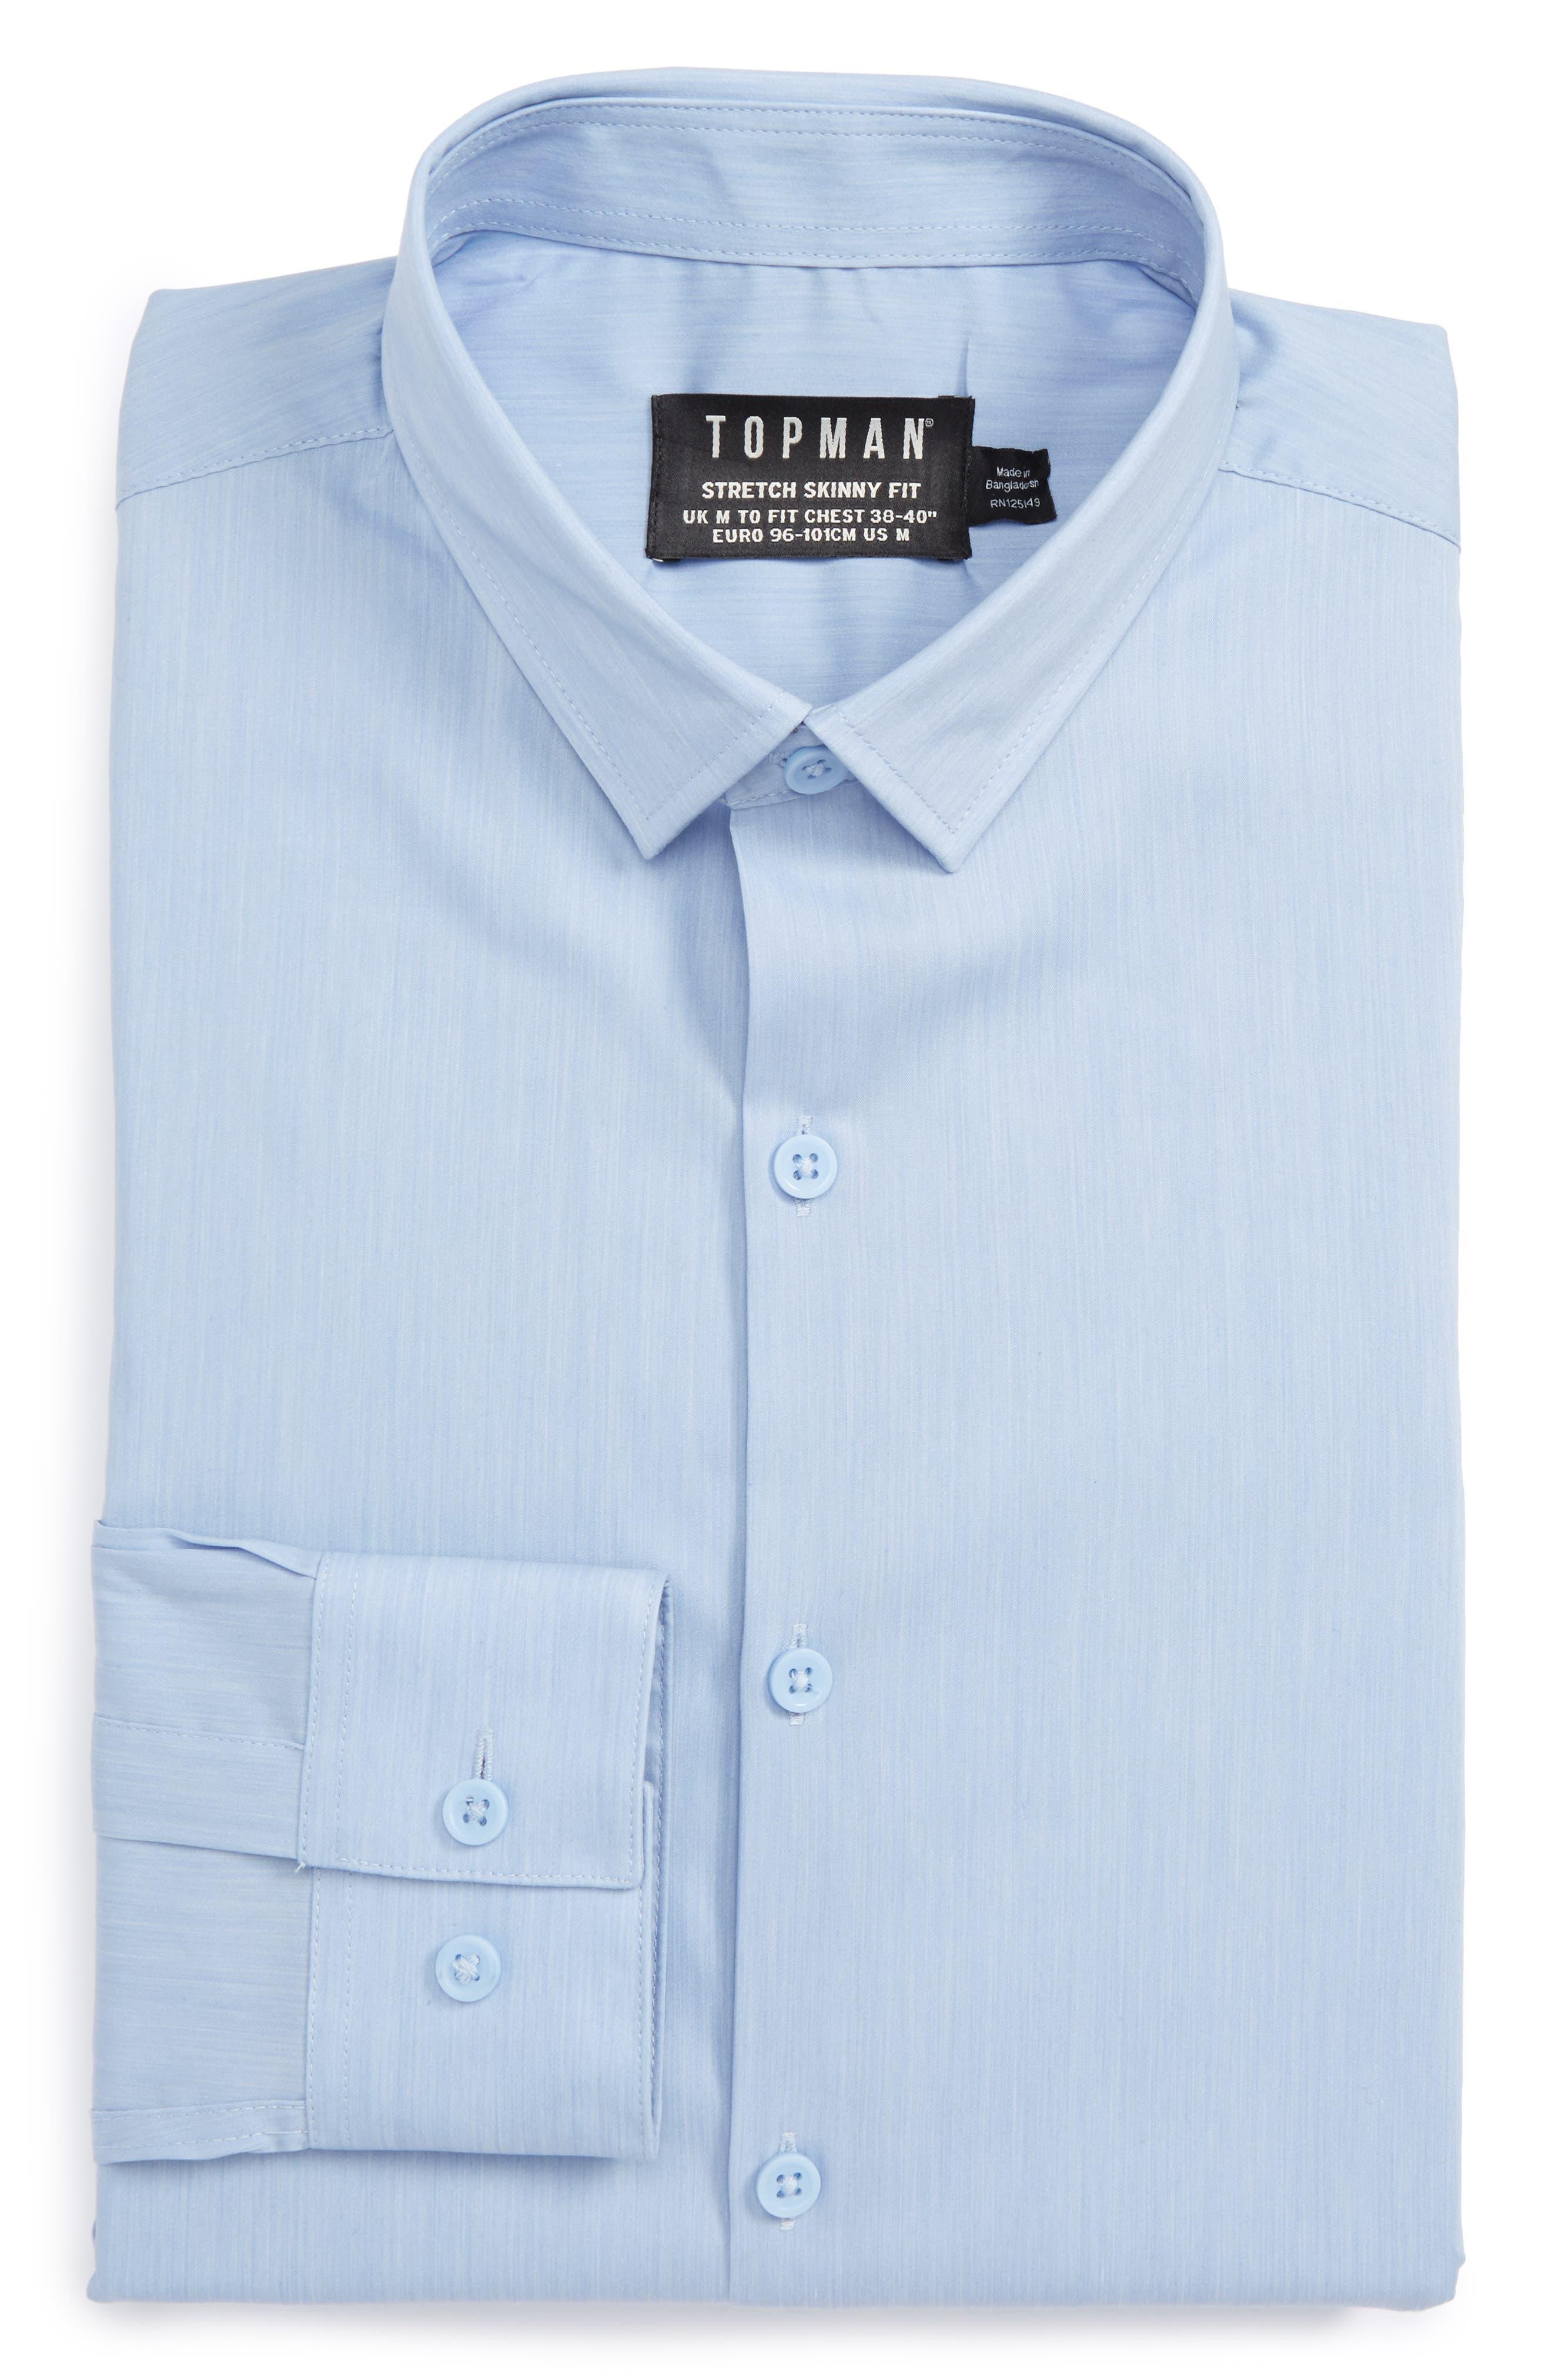 Main Image - Topman Muscle Fit Shirt